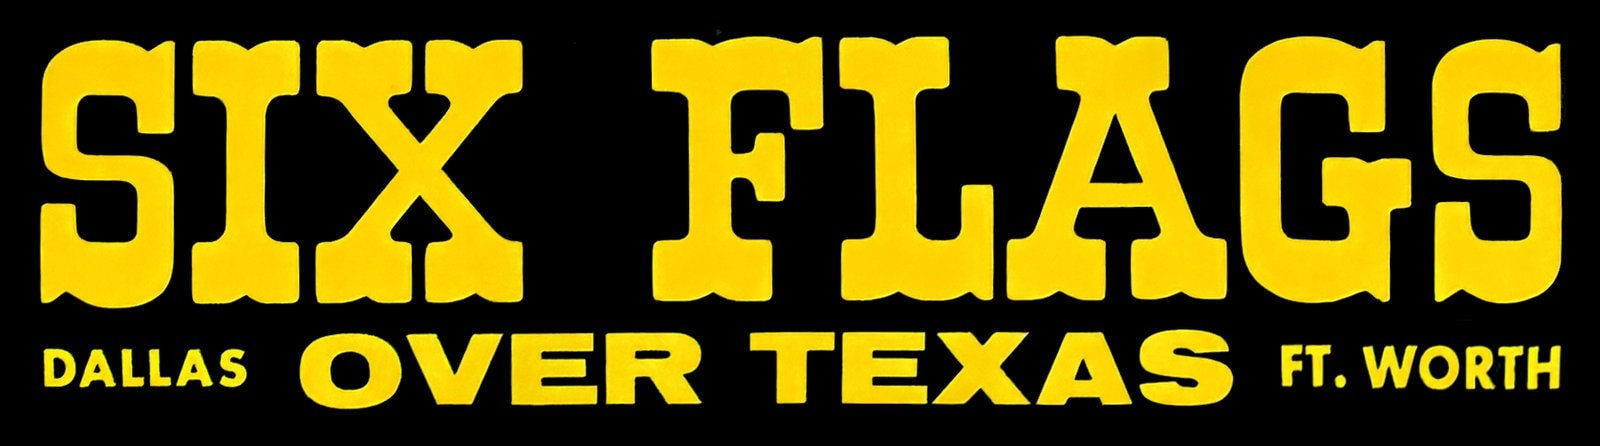 Retro Six Flags Over Texas bumper sticker